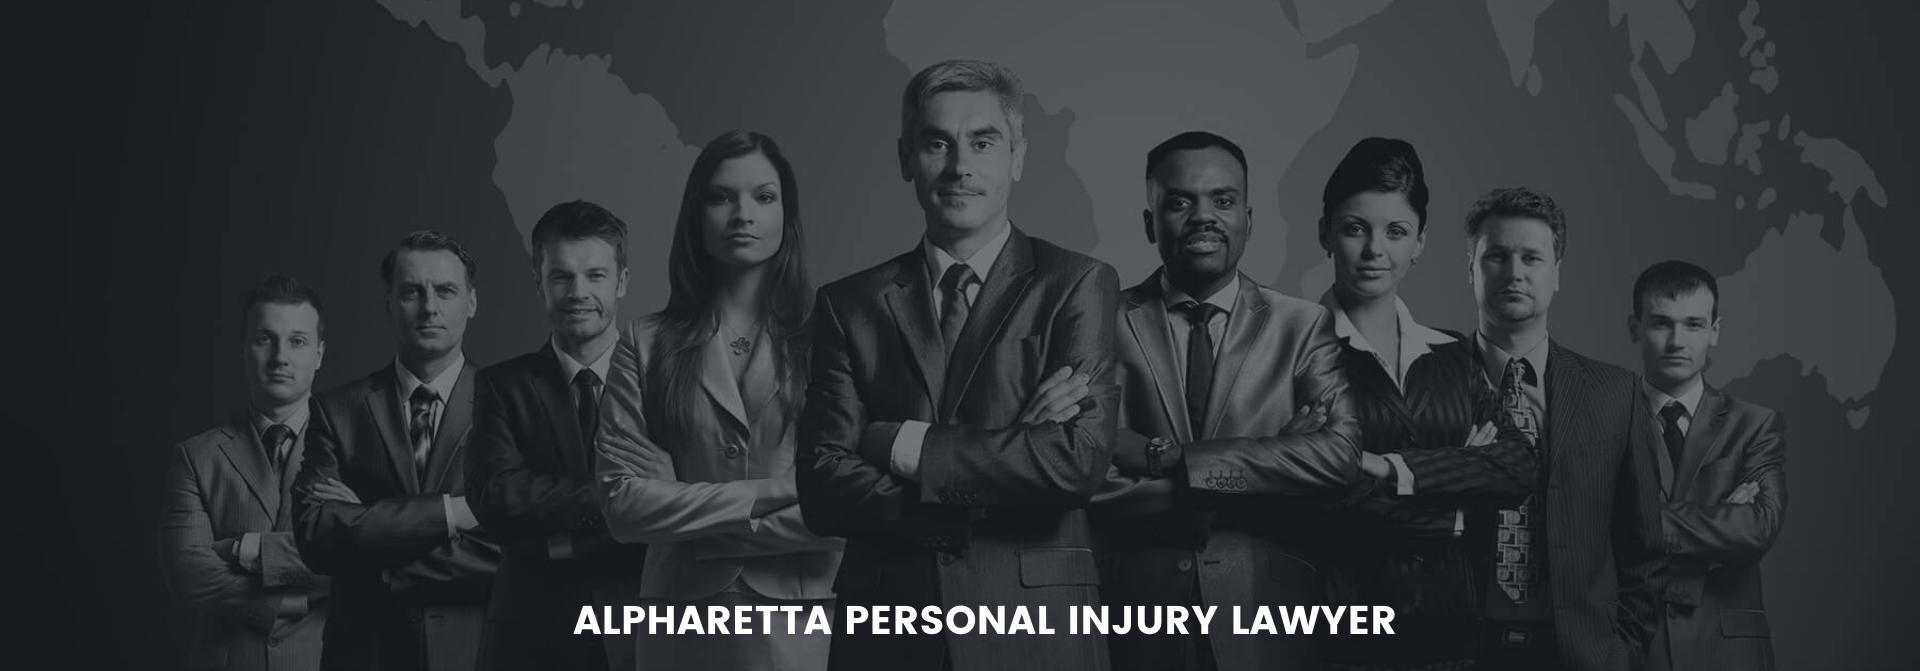 Alpharetta personal injury lawyer